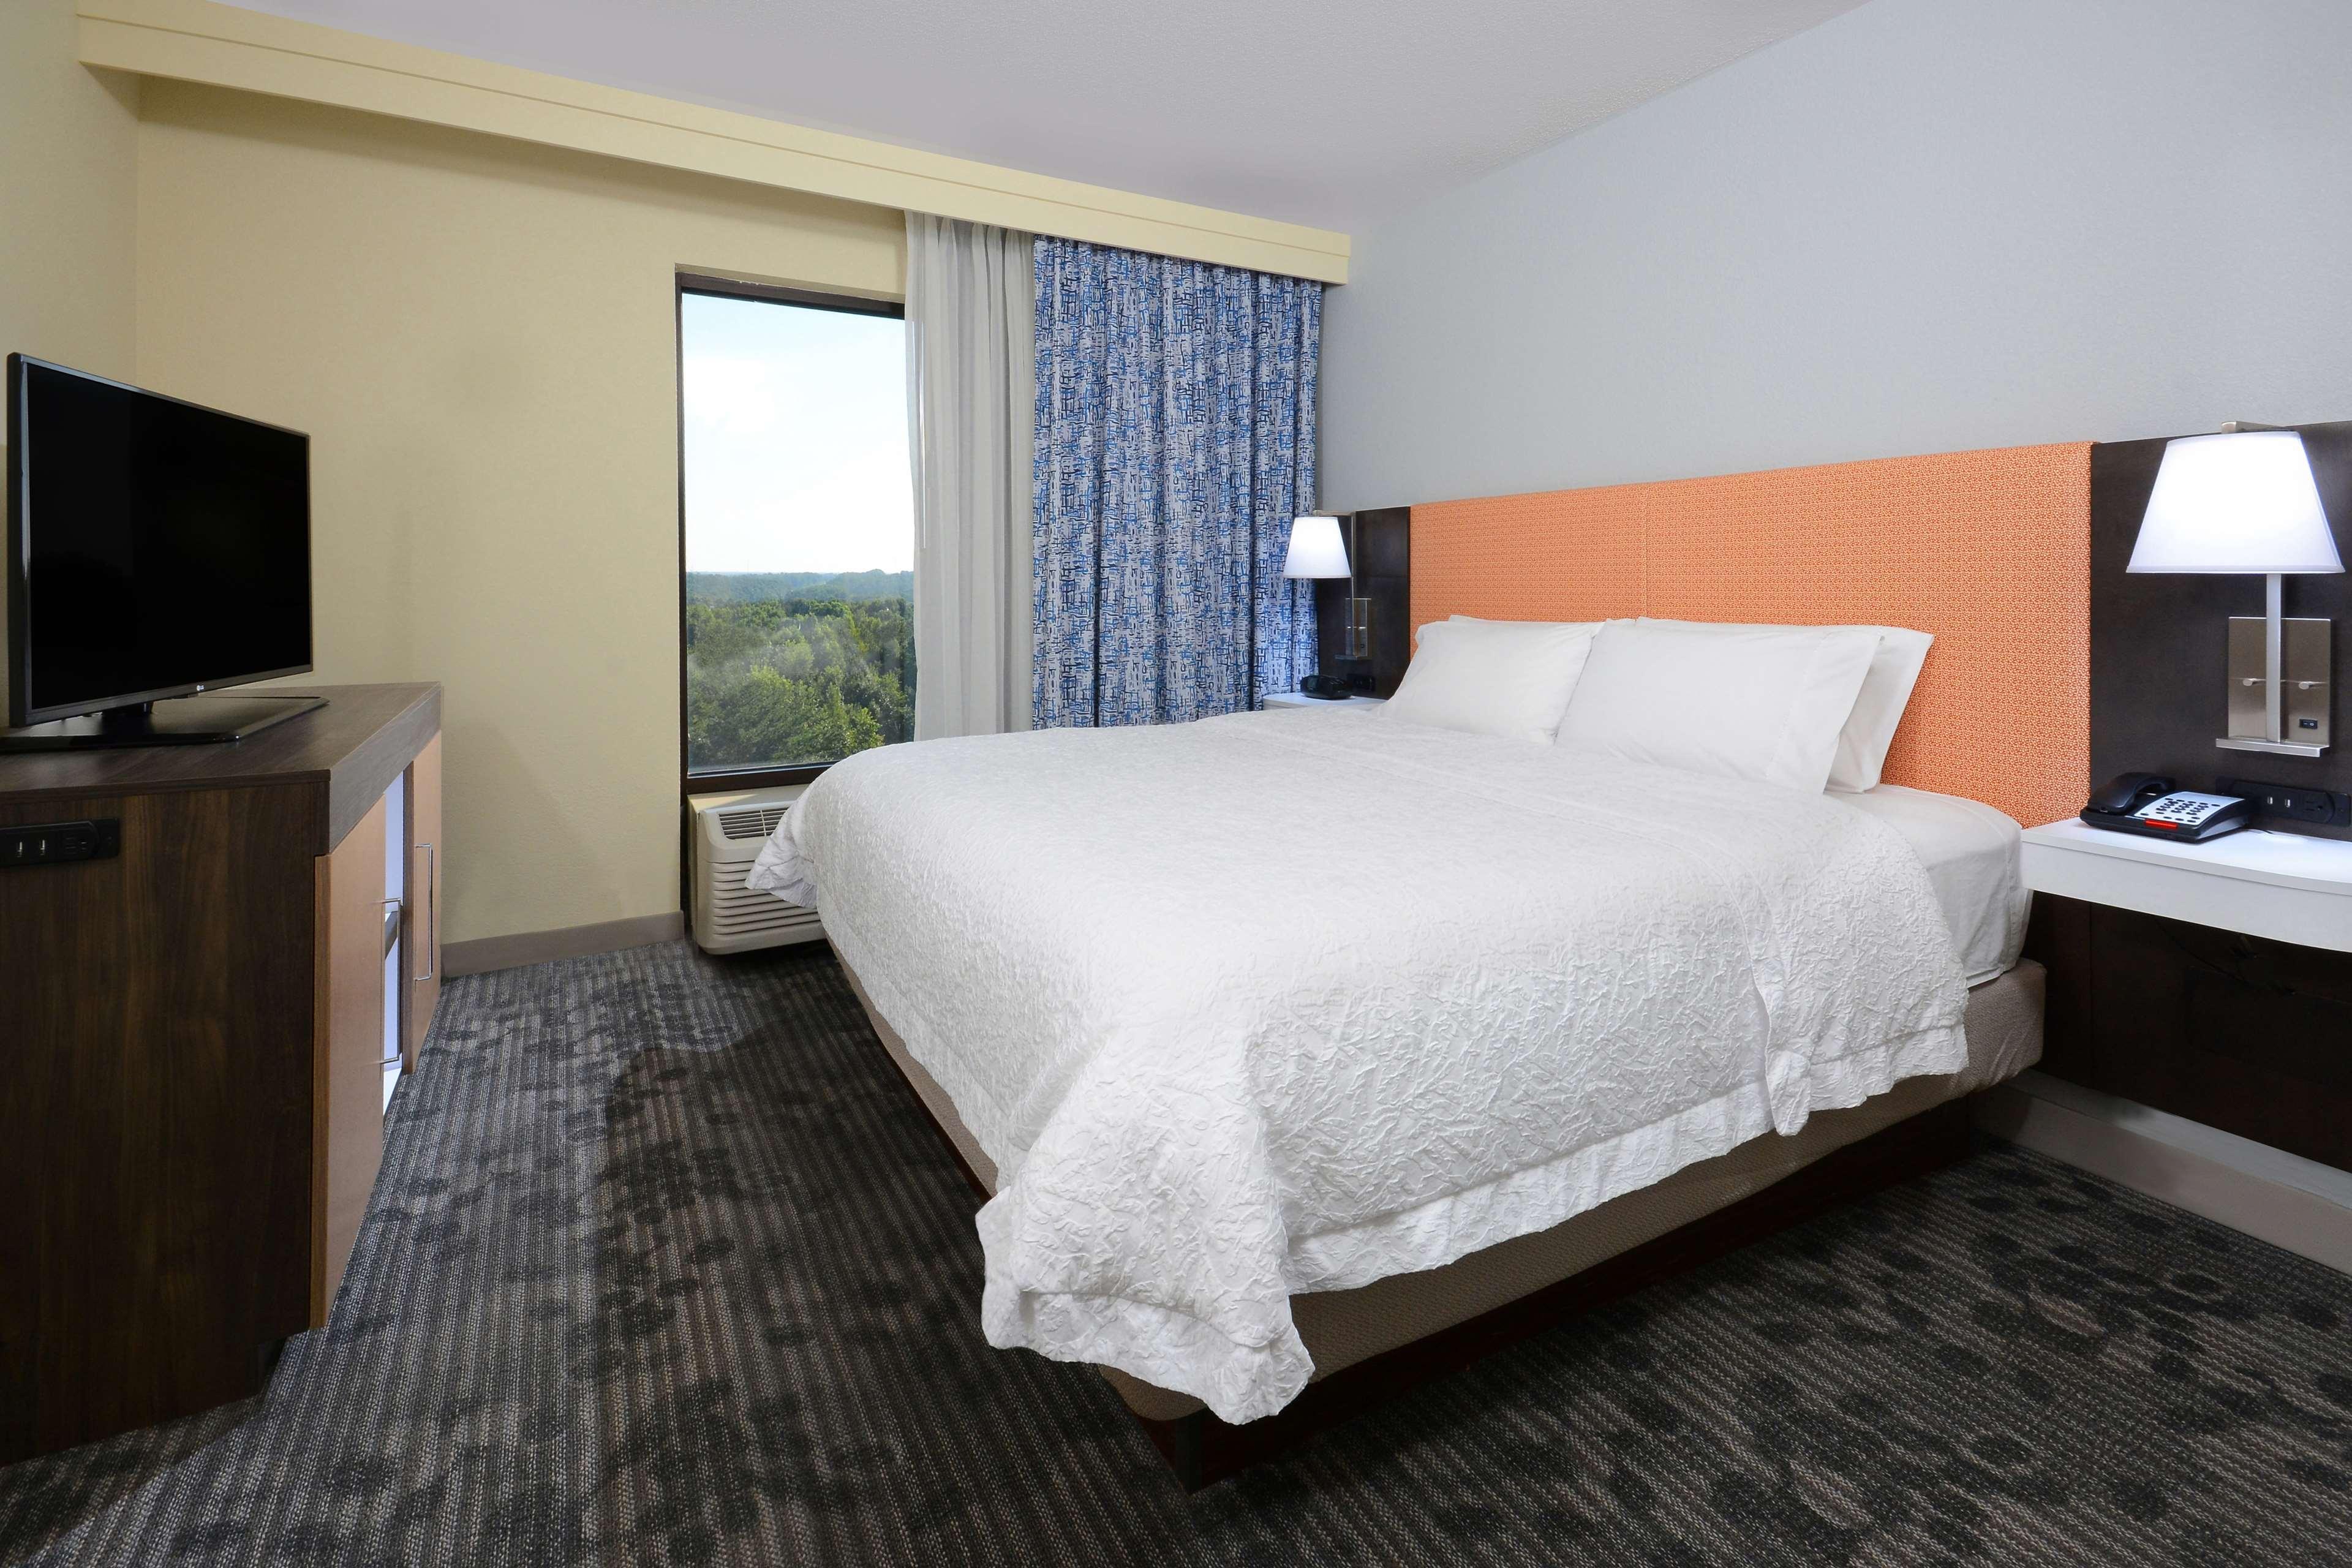 Hampton Inn & Suites Greenville/Spartanburg I-85 image 25